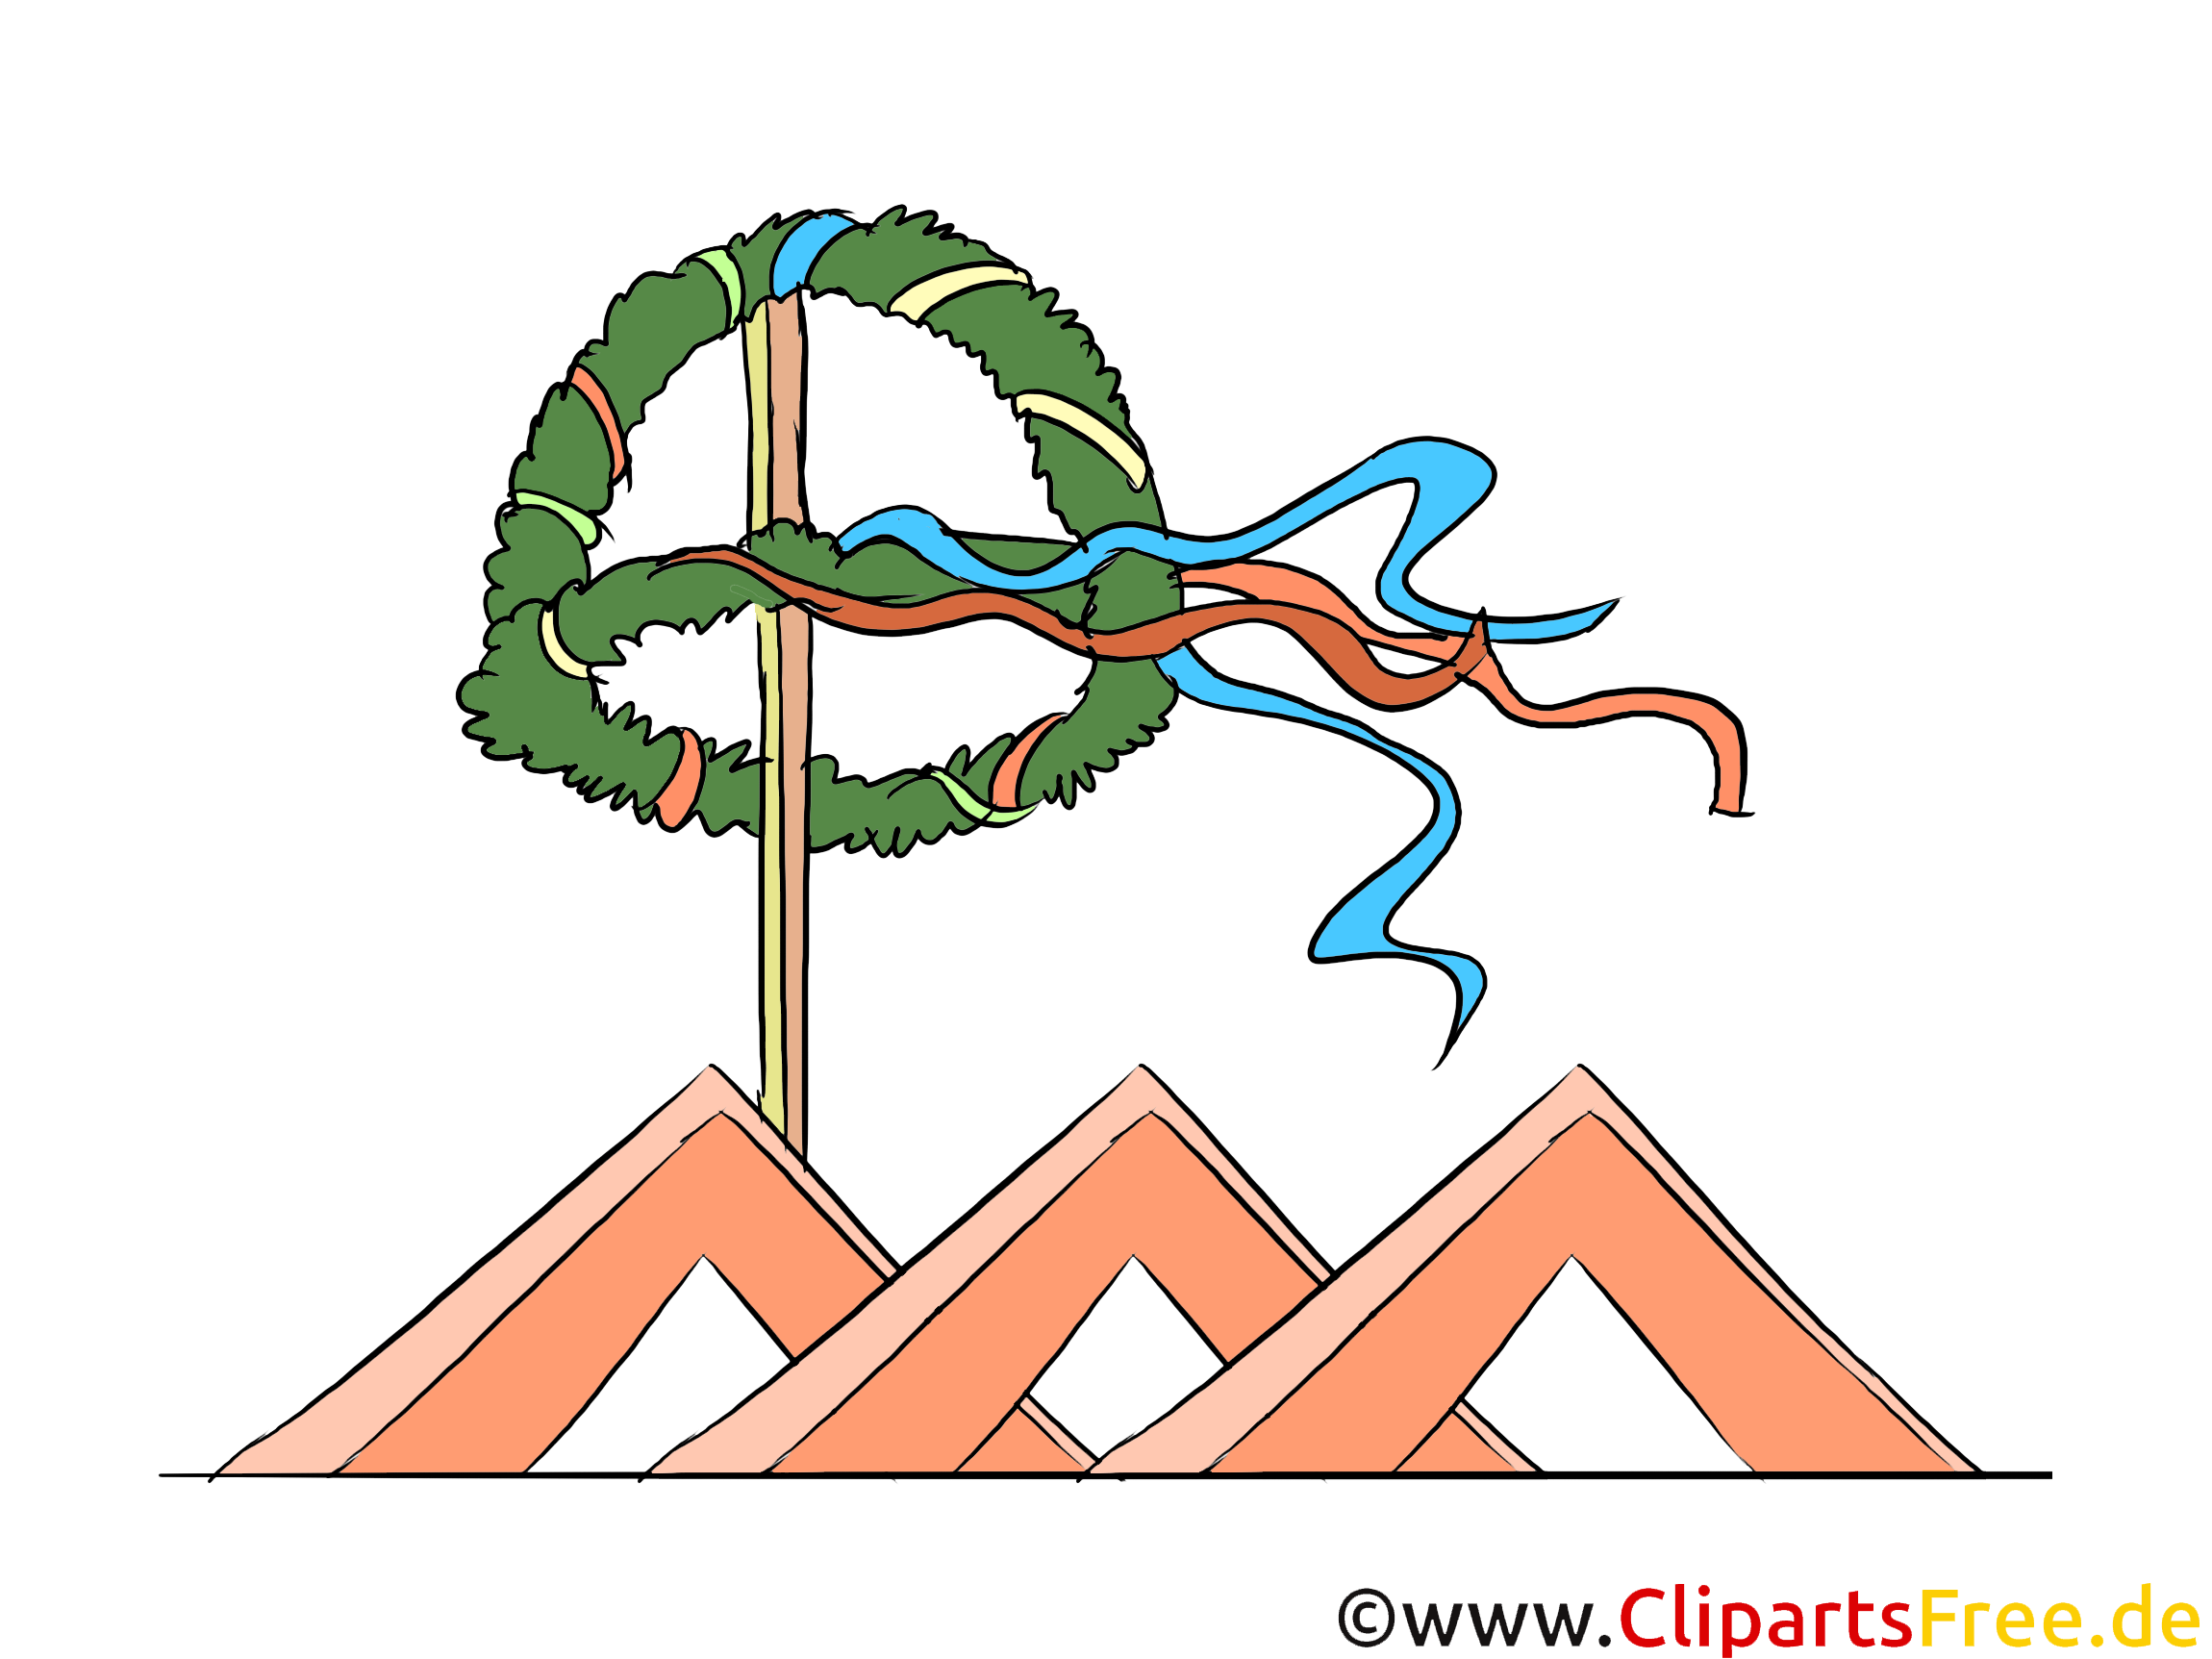 Richtfest Clipart